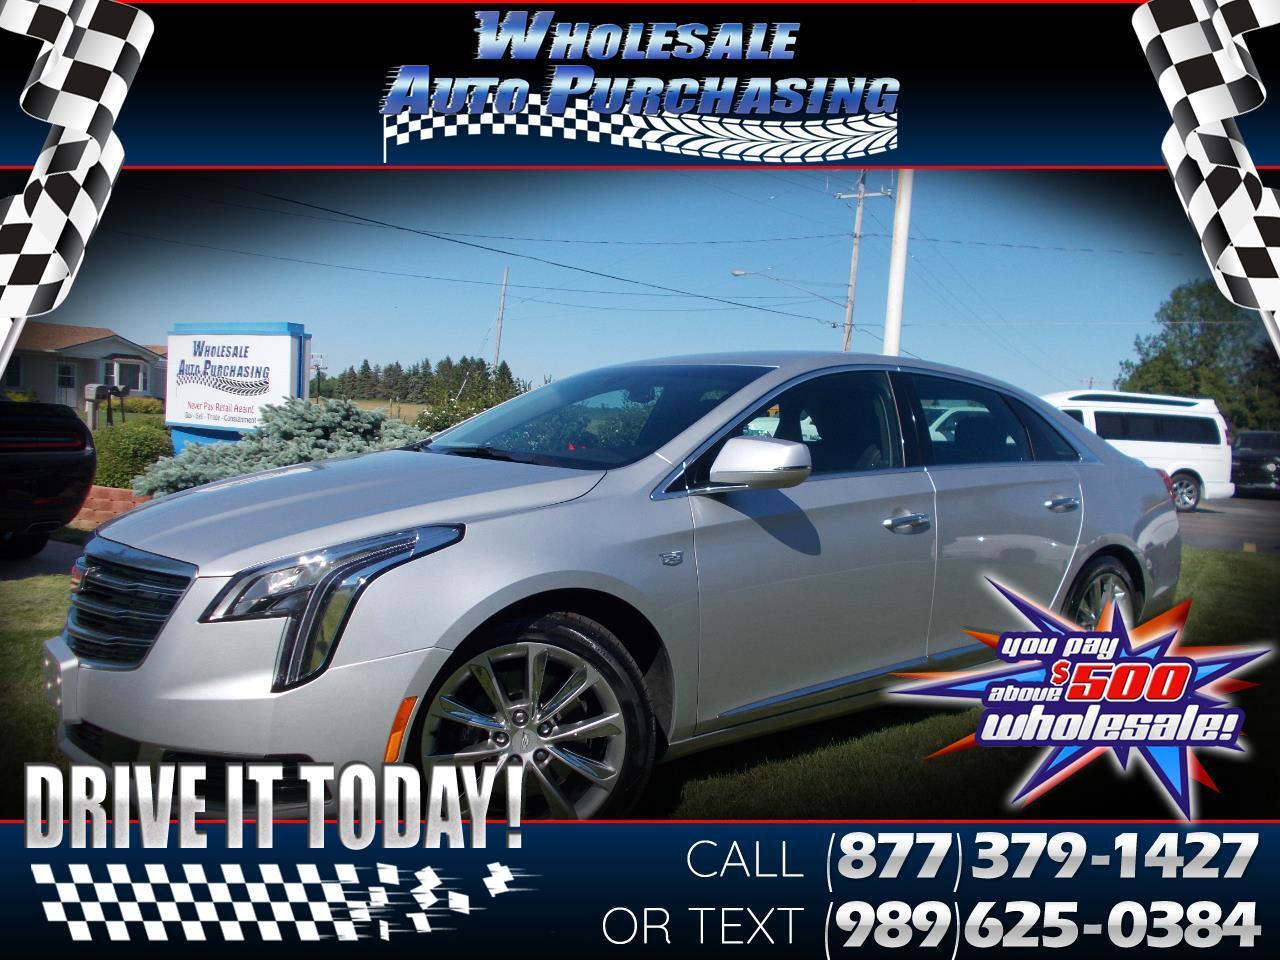 2018 Cadillac XTS 4dr Sdn FWD